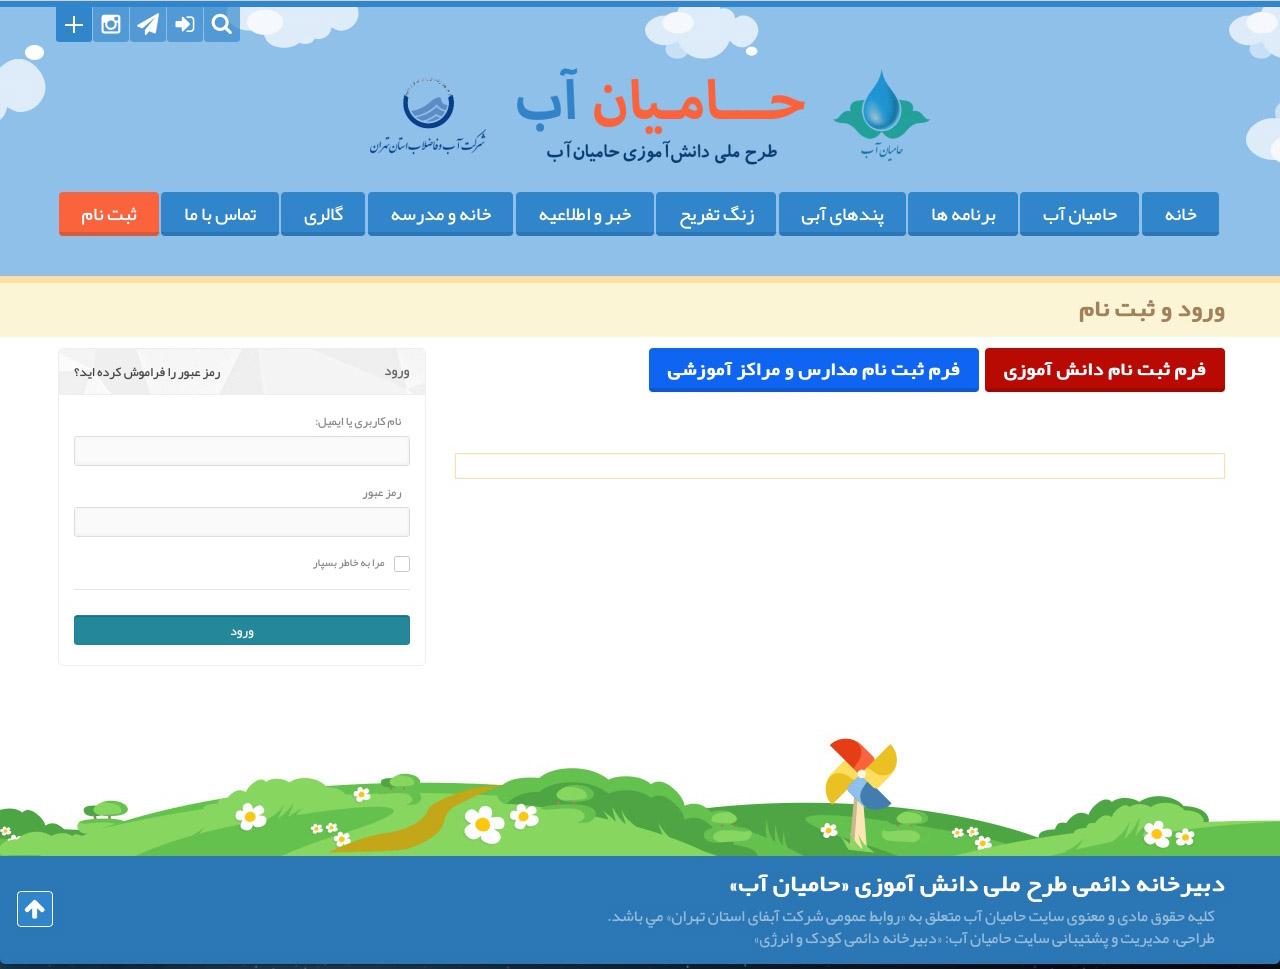 حامیان آب - افتتاح۴